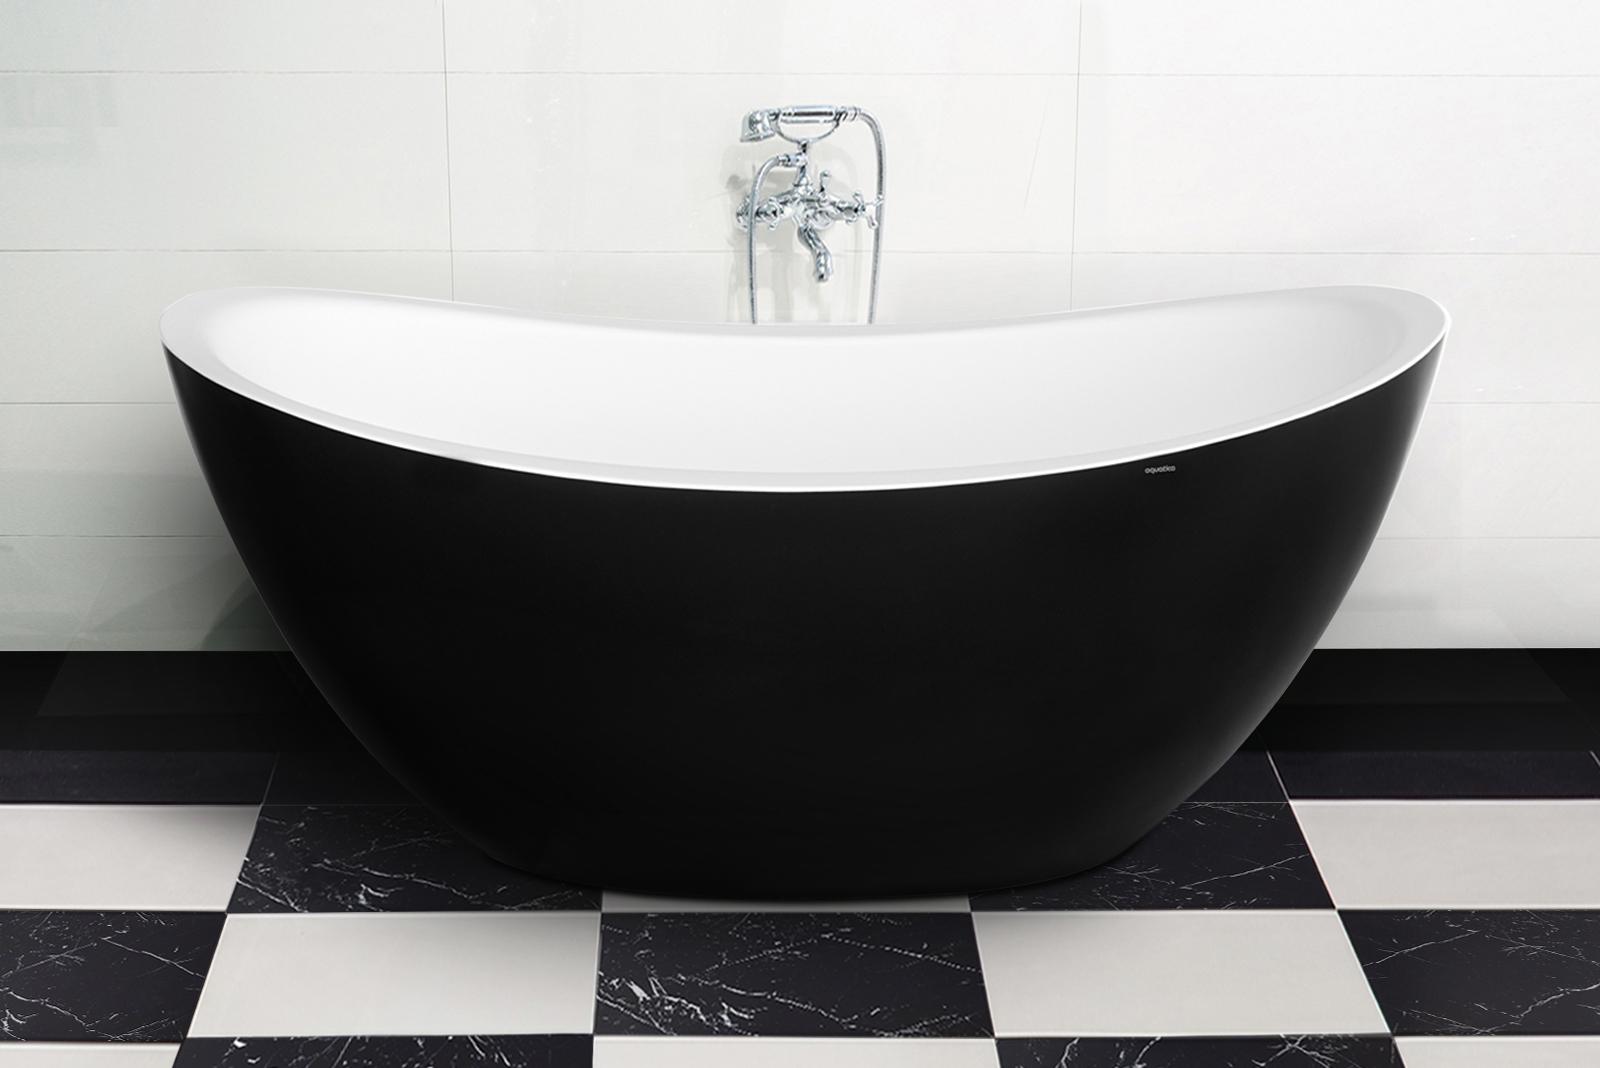 Aquatica purescape 171m blck wht freestanding solid surface bathtub customer photos 02